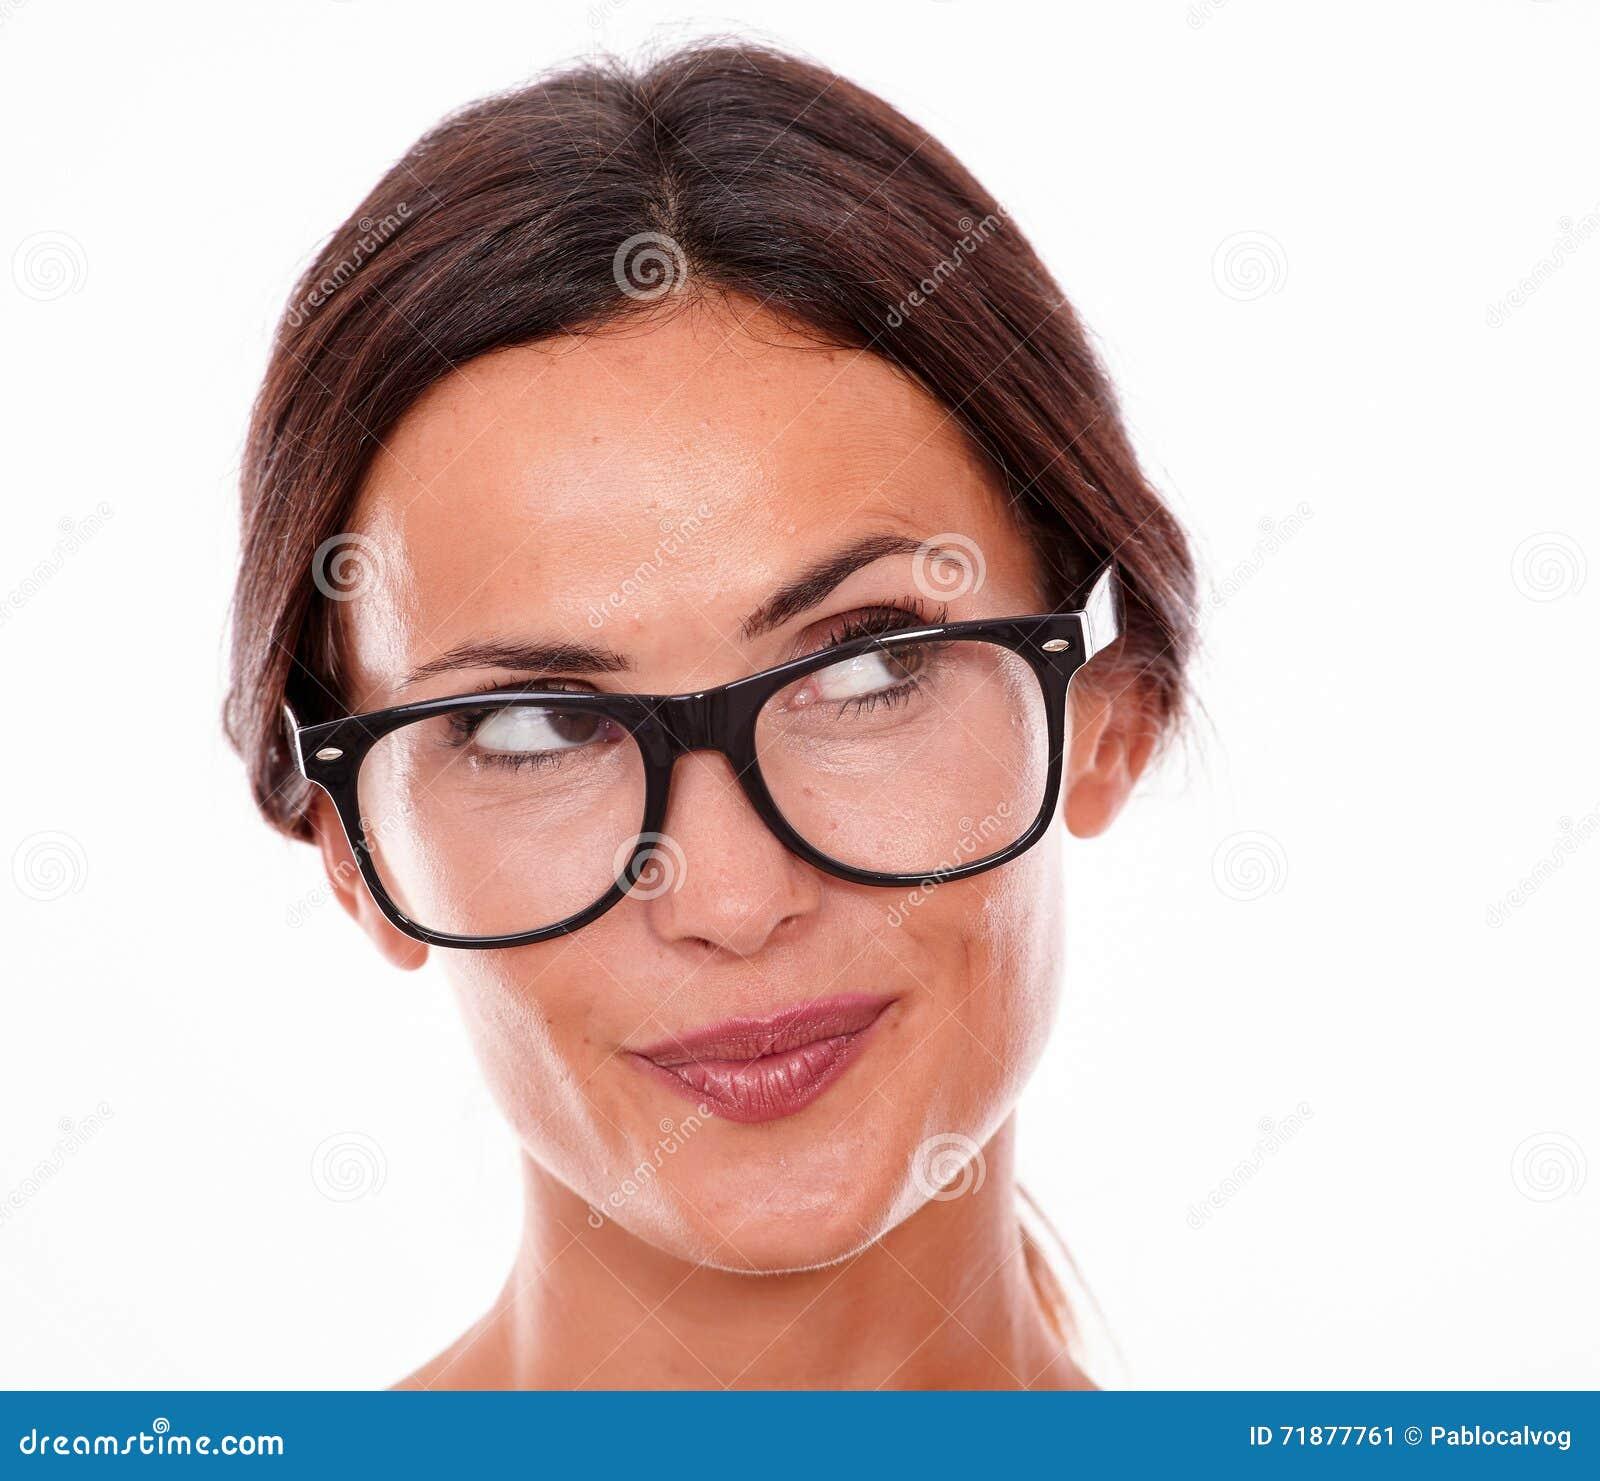 Sexy Nude Teen Girls Wearing Reading Glasses - HOT GIRLS